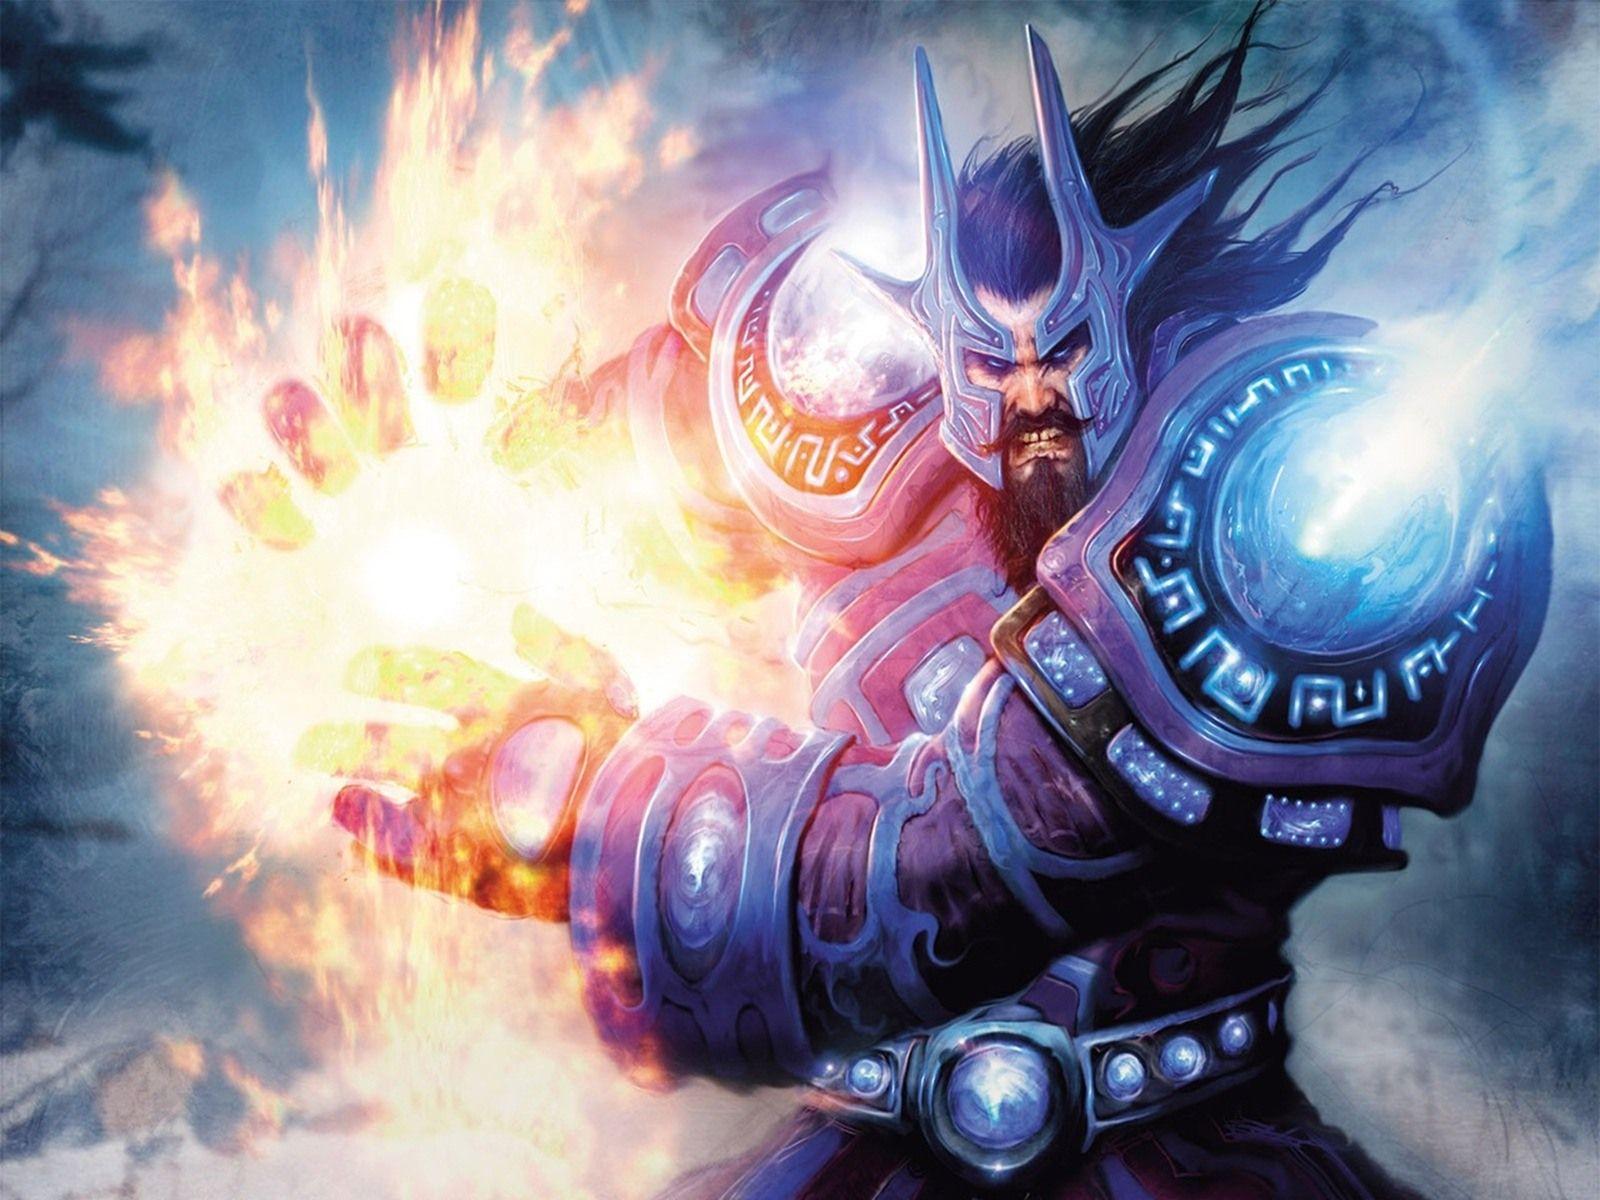 World Of Warcraft Mage Desktop Wallpaper World Of Warcraft Wallpaper World Of Warcraft Game World Of Warcraft